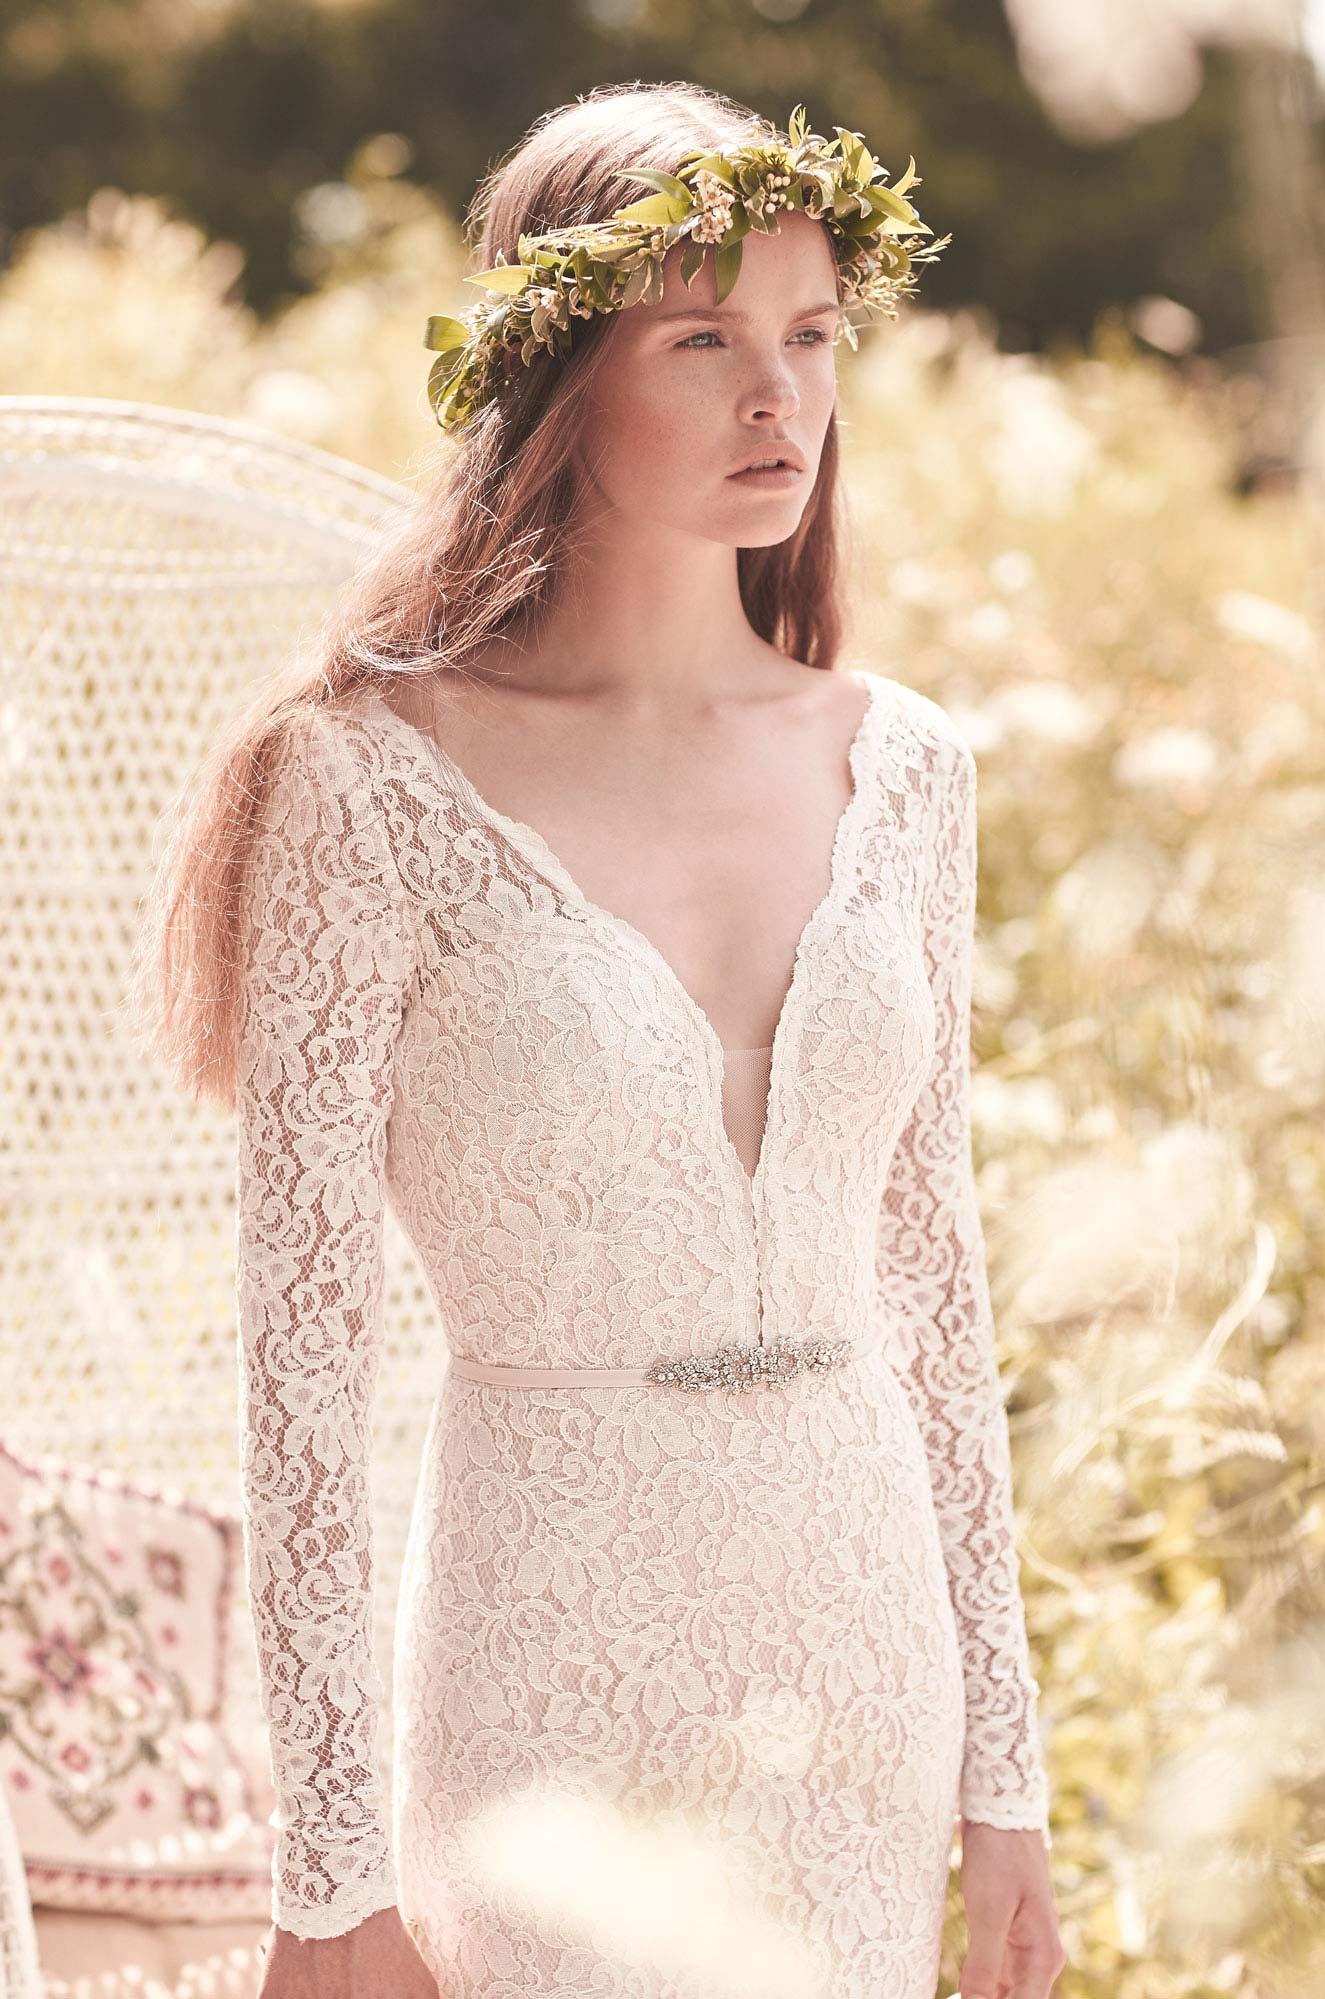 Long Sleeve Wedding Dress - Style #2050 | Mikaella Bridal